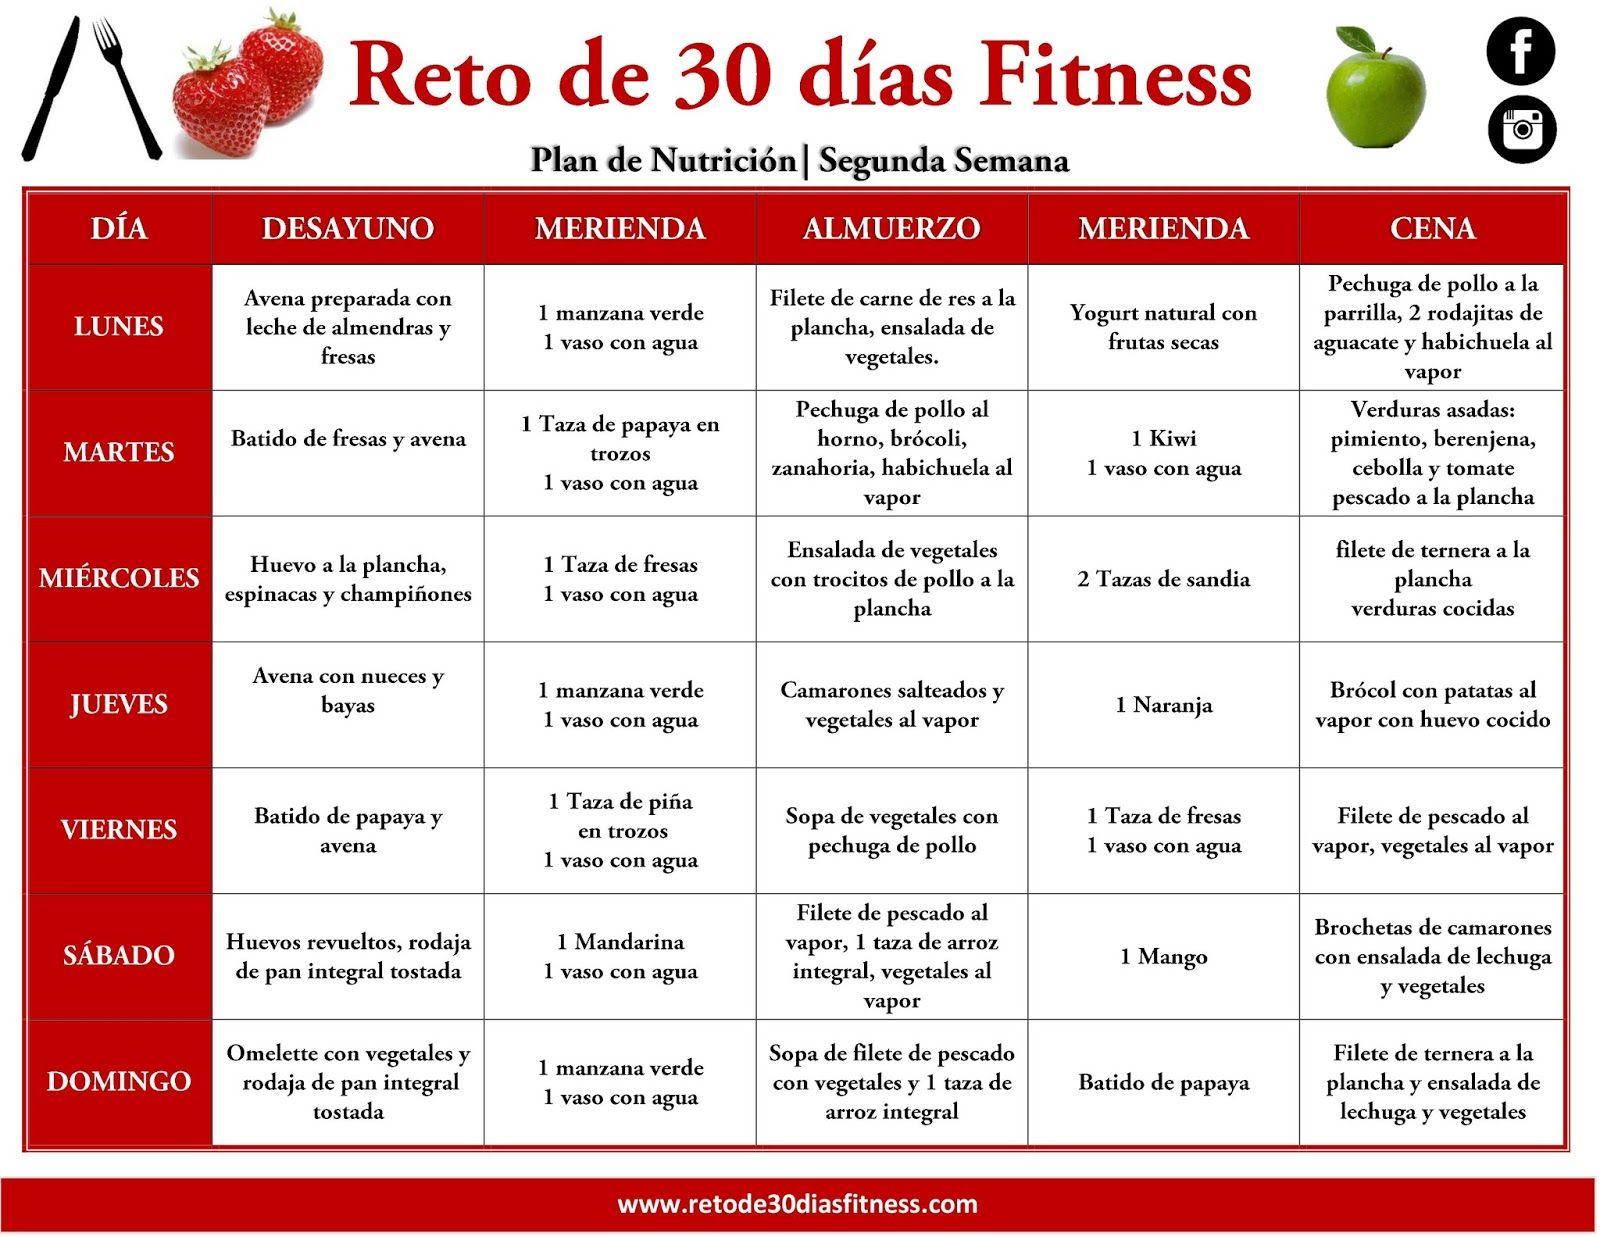 plan nutricional para bajar de peso segunda semana